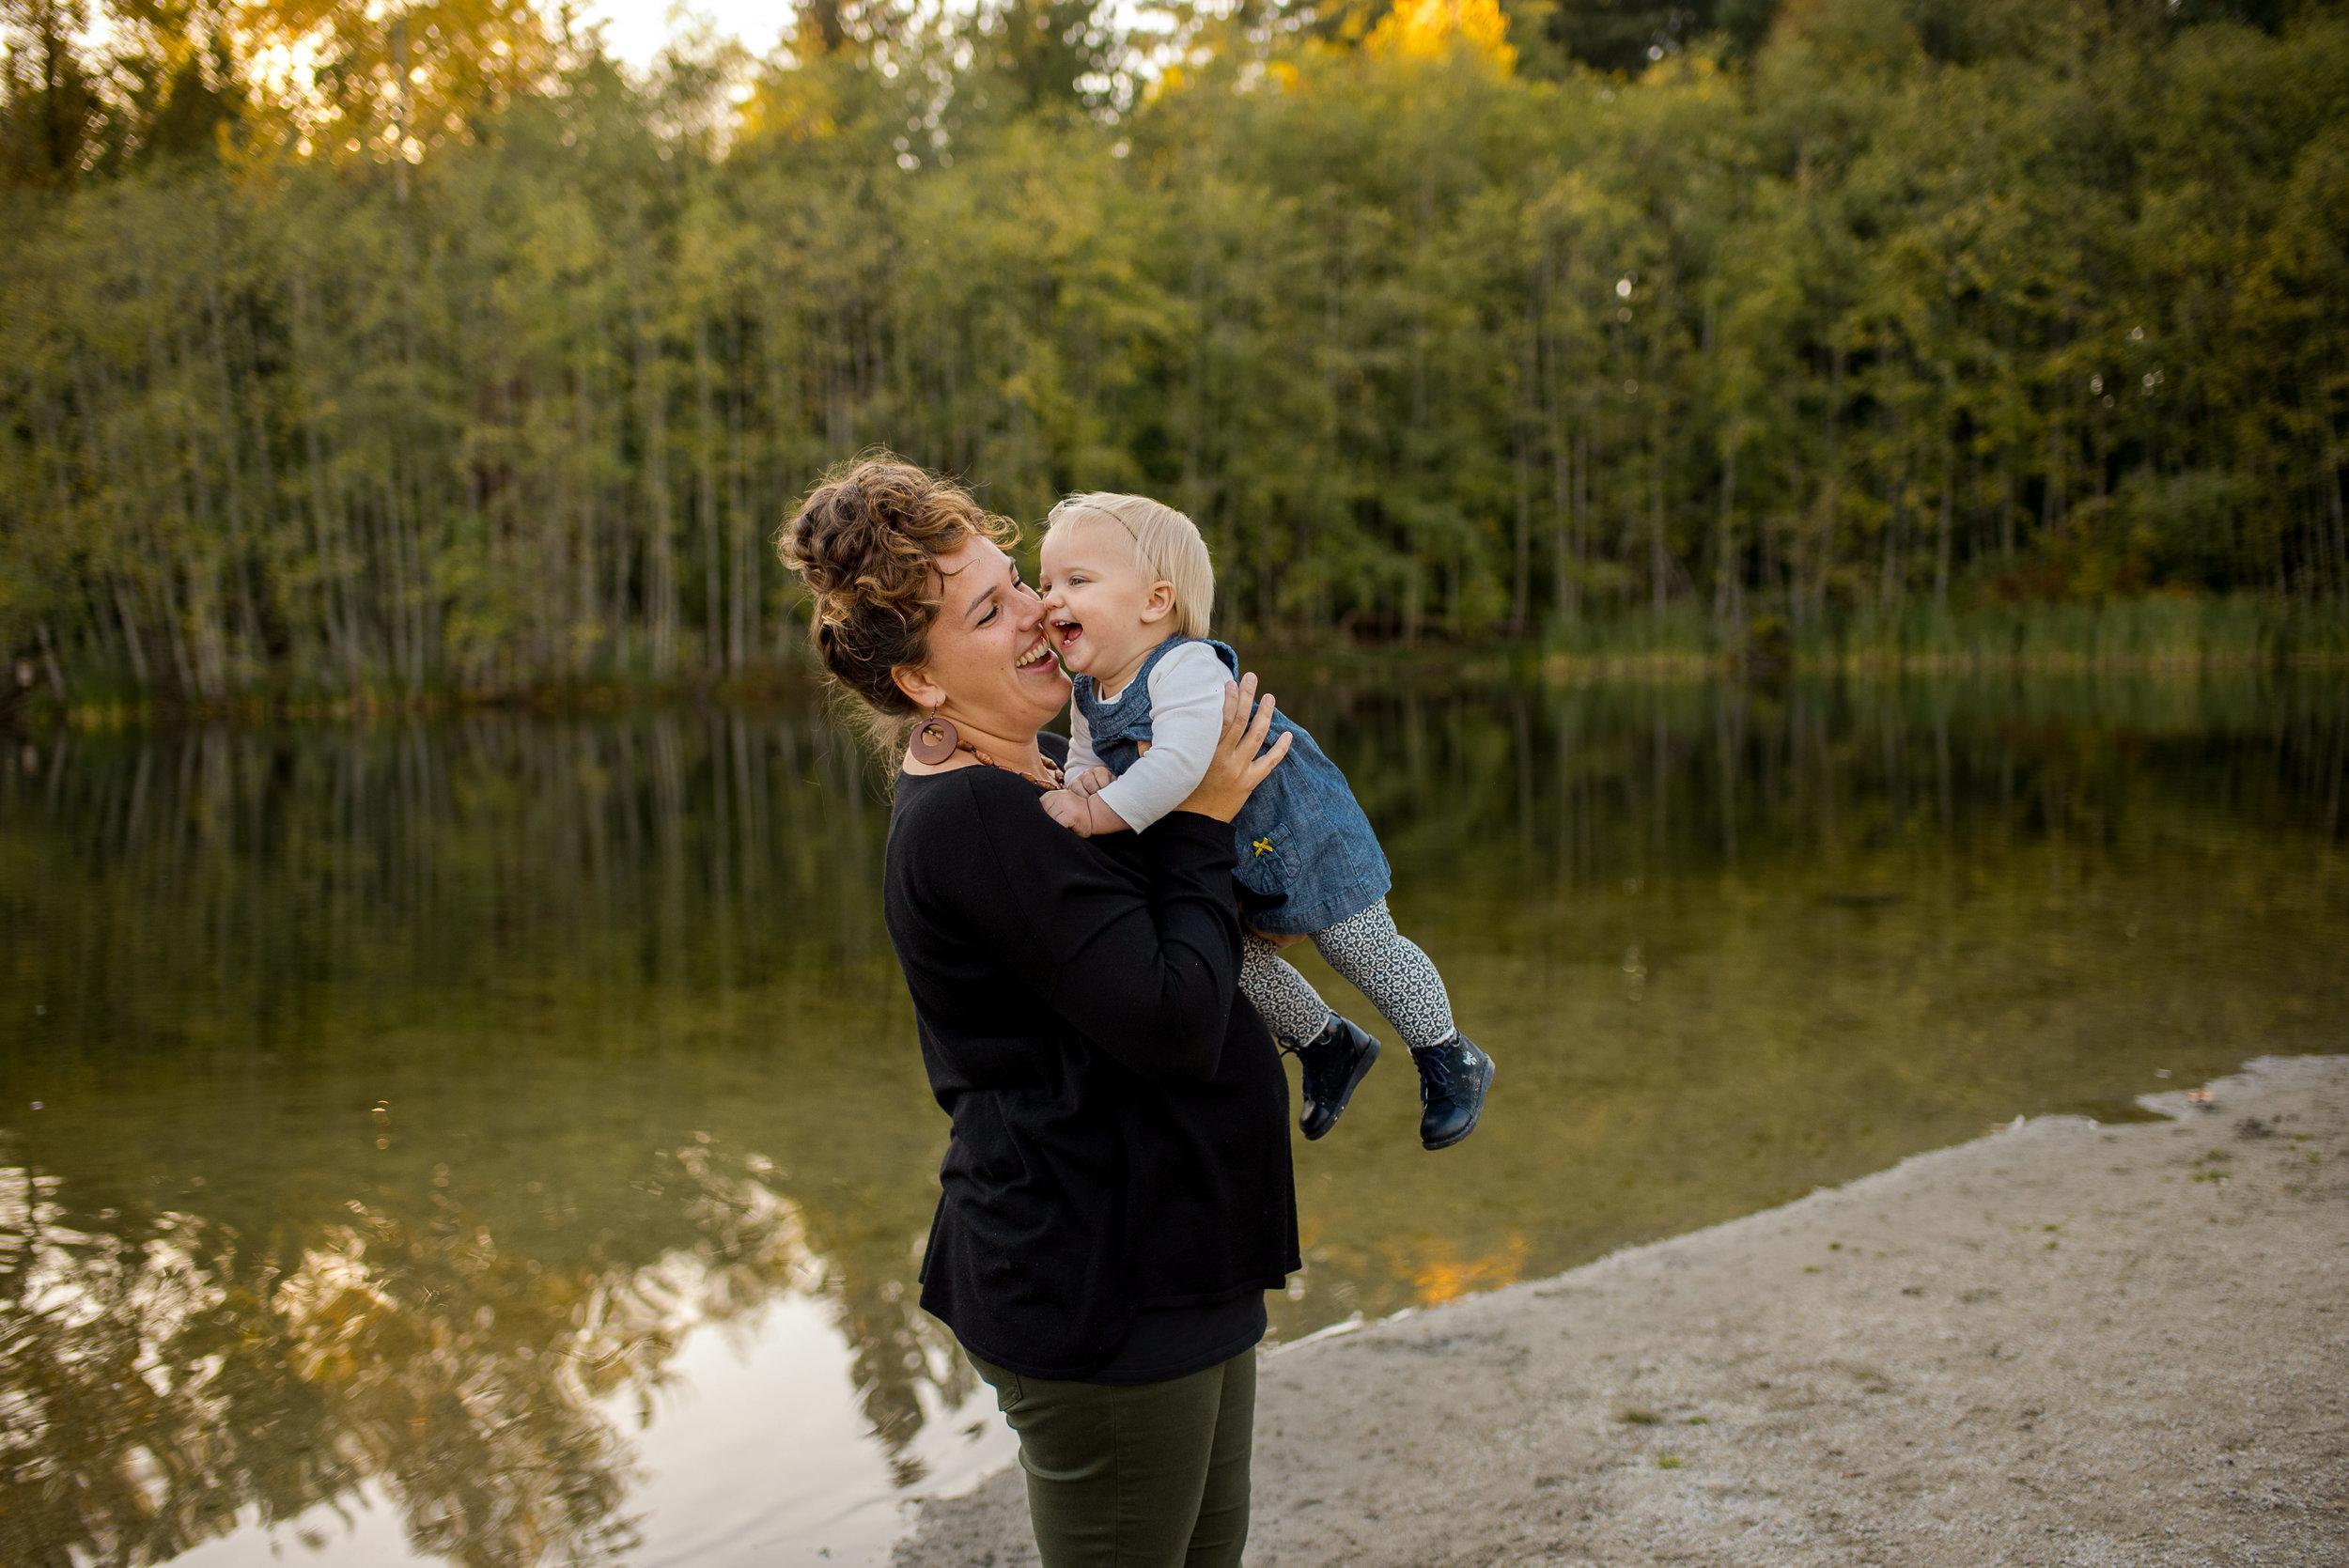 Green Timbers Park Family Photographer11.JPG